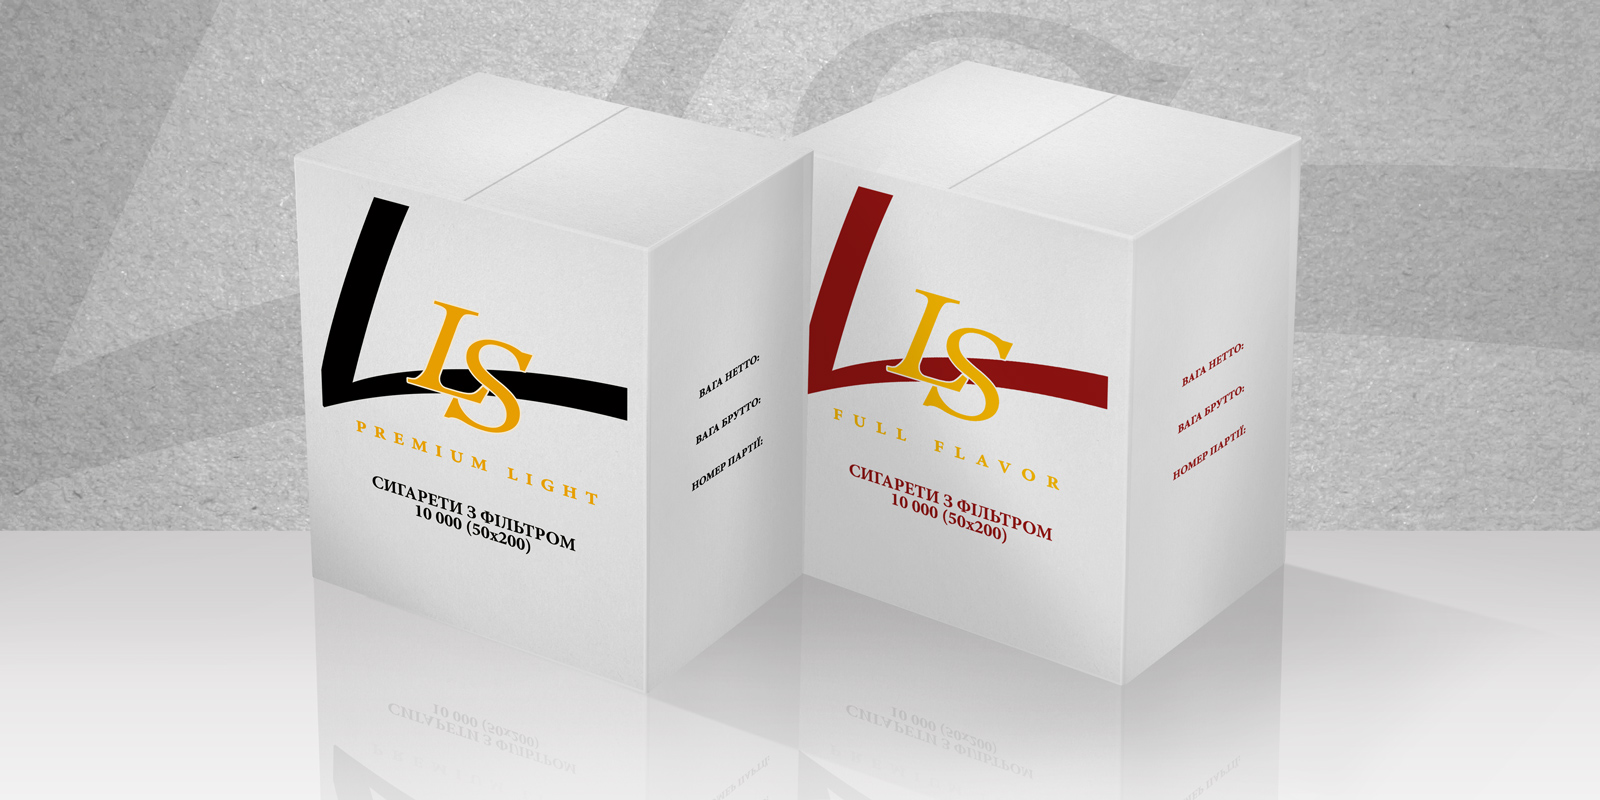 TM LS;;;;;;Разработка дизайна тары для сигарет ТМ LS full flavor;;;;;;<span>Клиент:</span> Львовская табачная Фабрика;;;;;;;;;;;;Разработка дизайна тары для сигарет ТМ LS full flavor;;;;;; 2 ;;;;;;